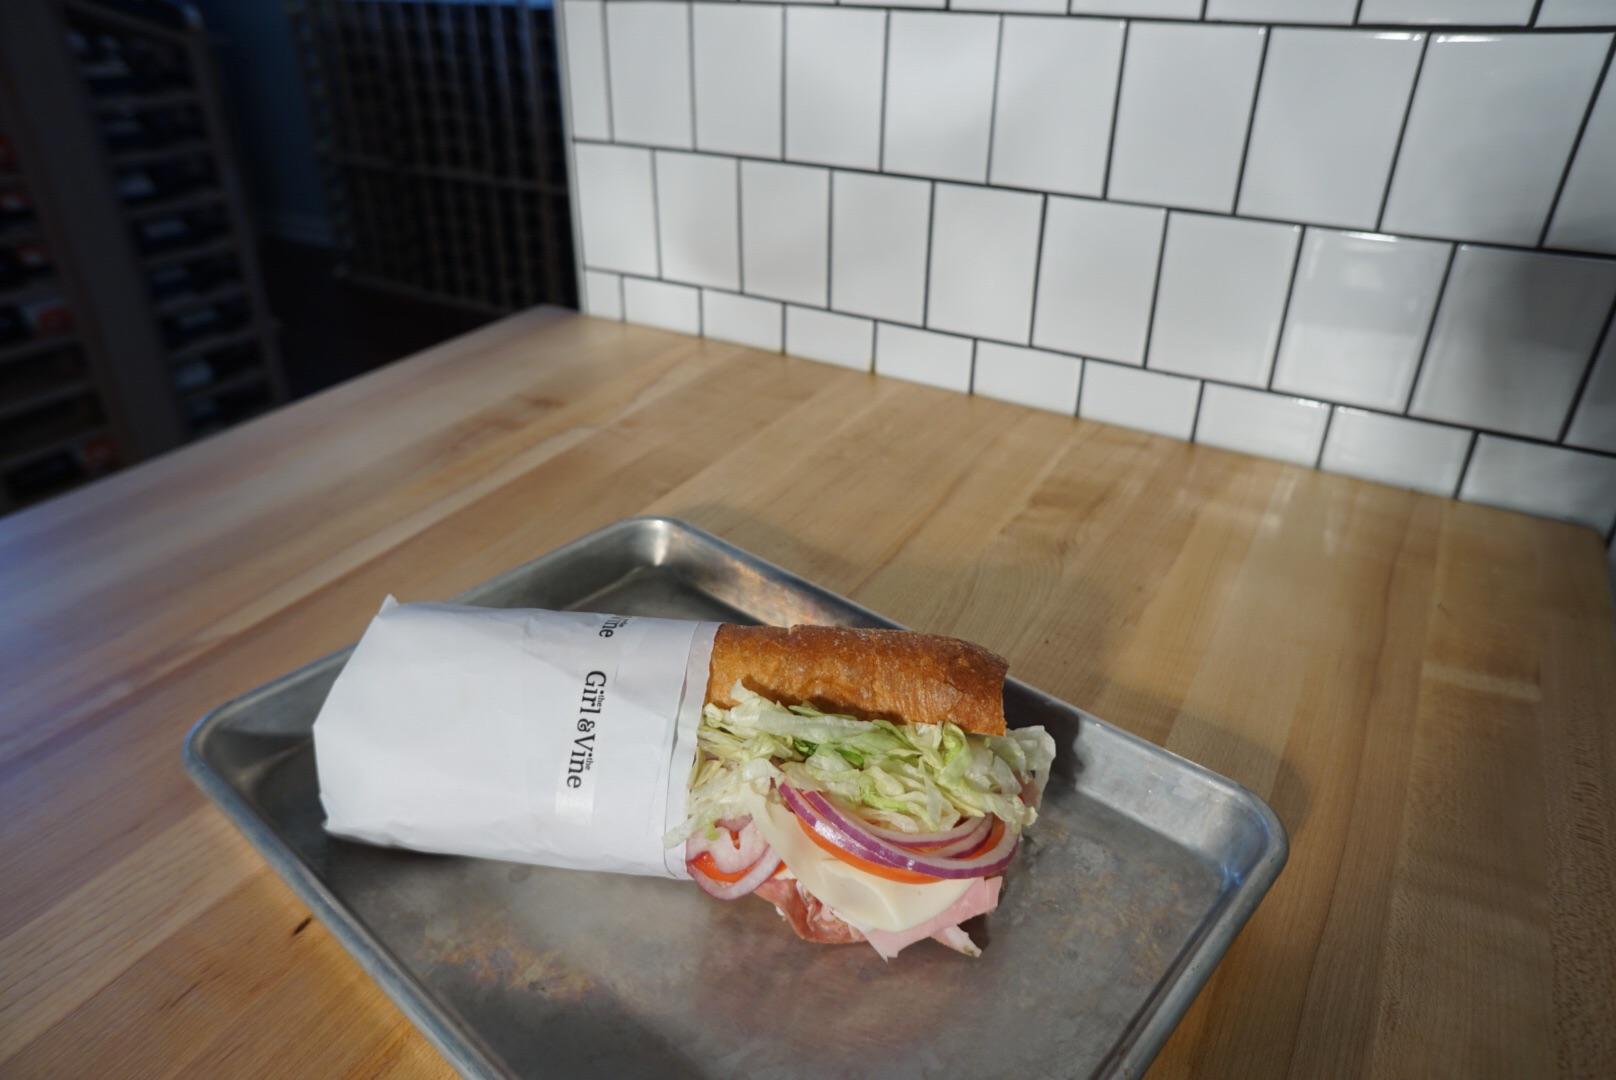 Takoma Park's New Cafe Stuffs Surprises Into Deli Sandwiches